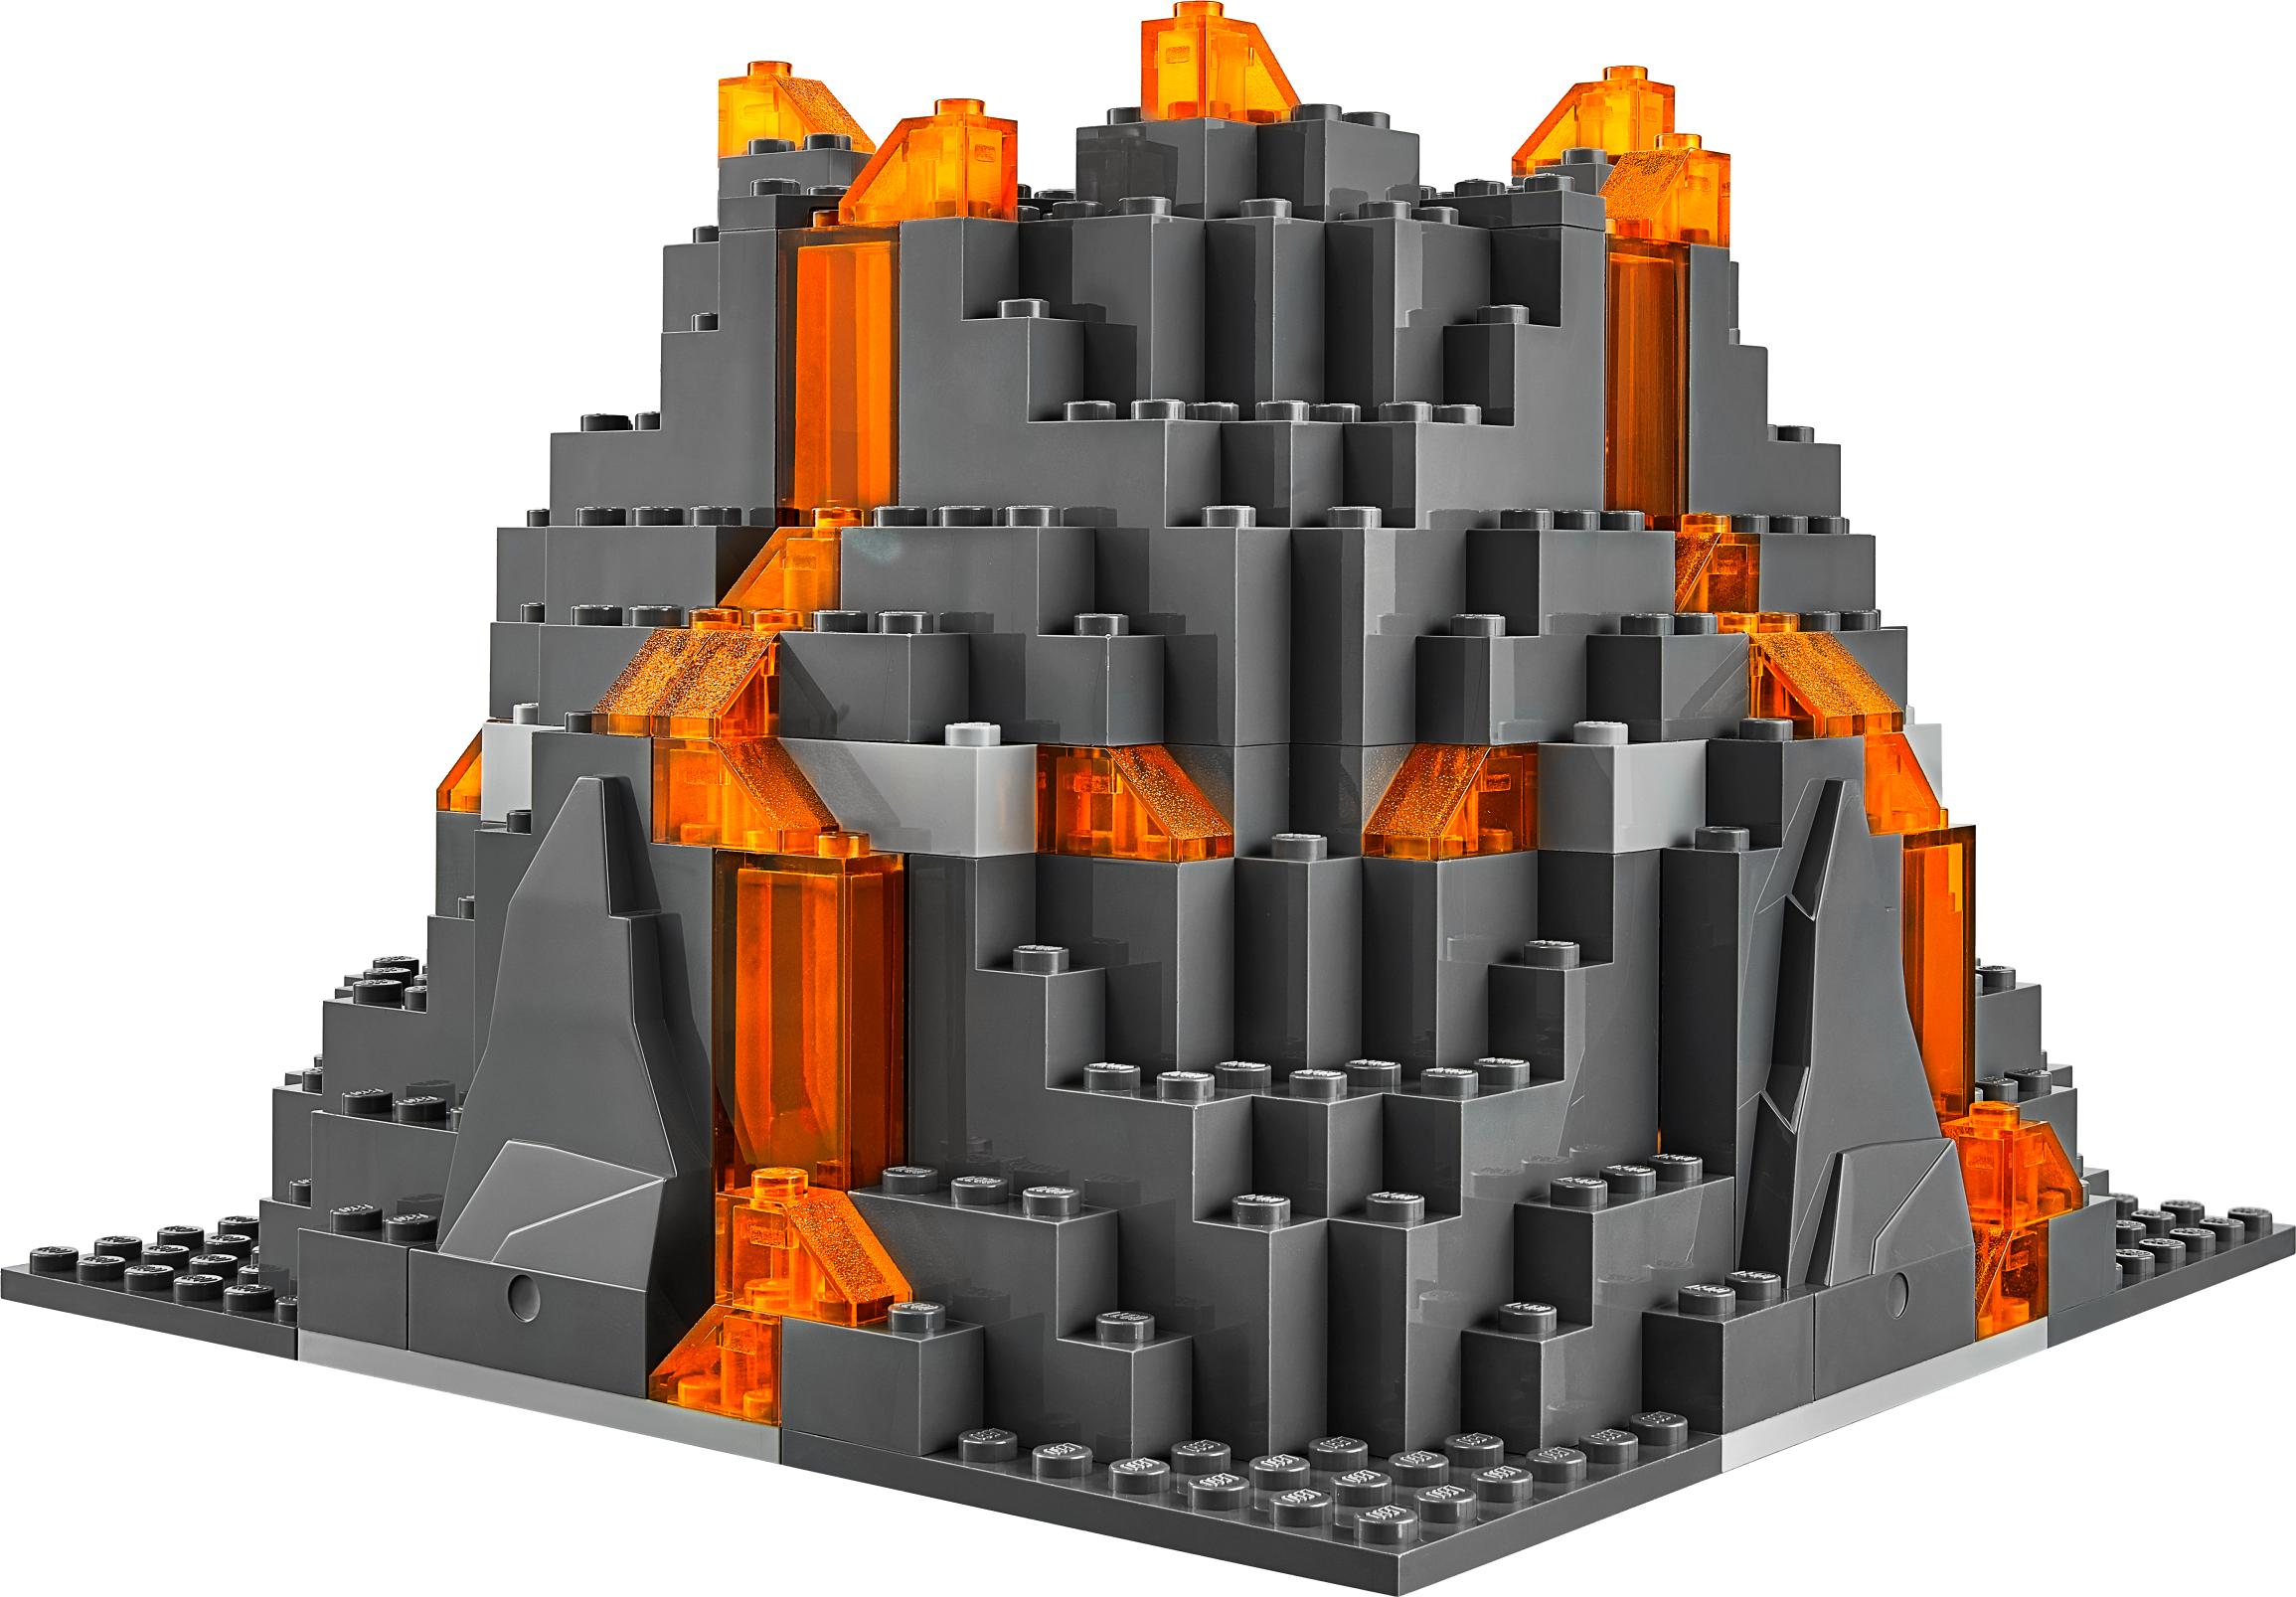 Volcano Exploration Base